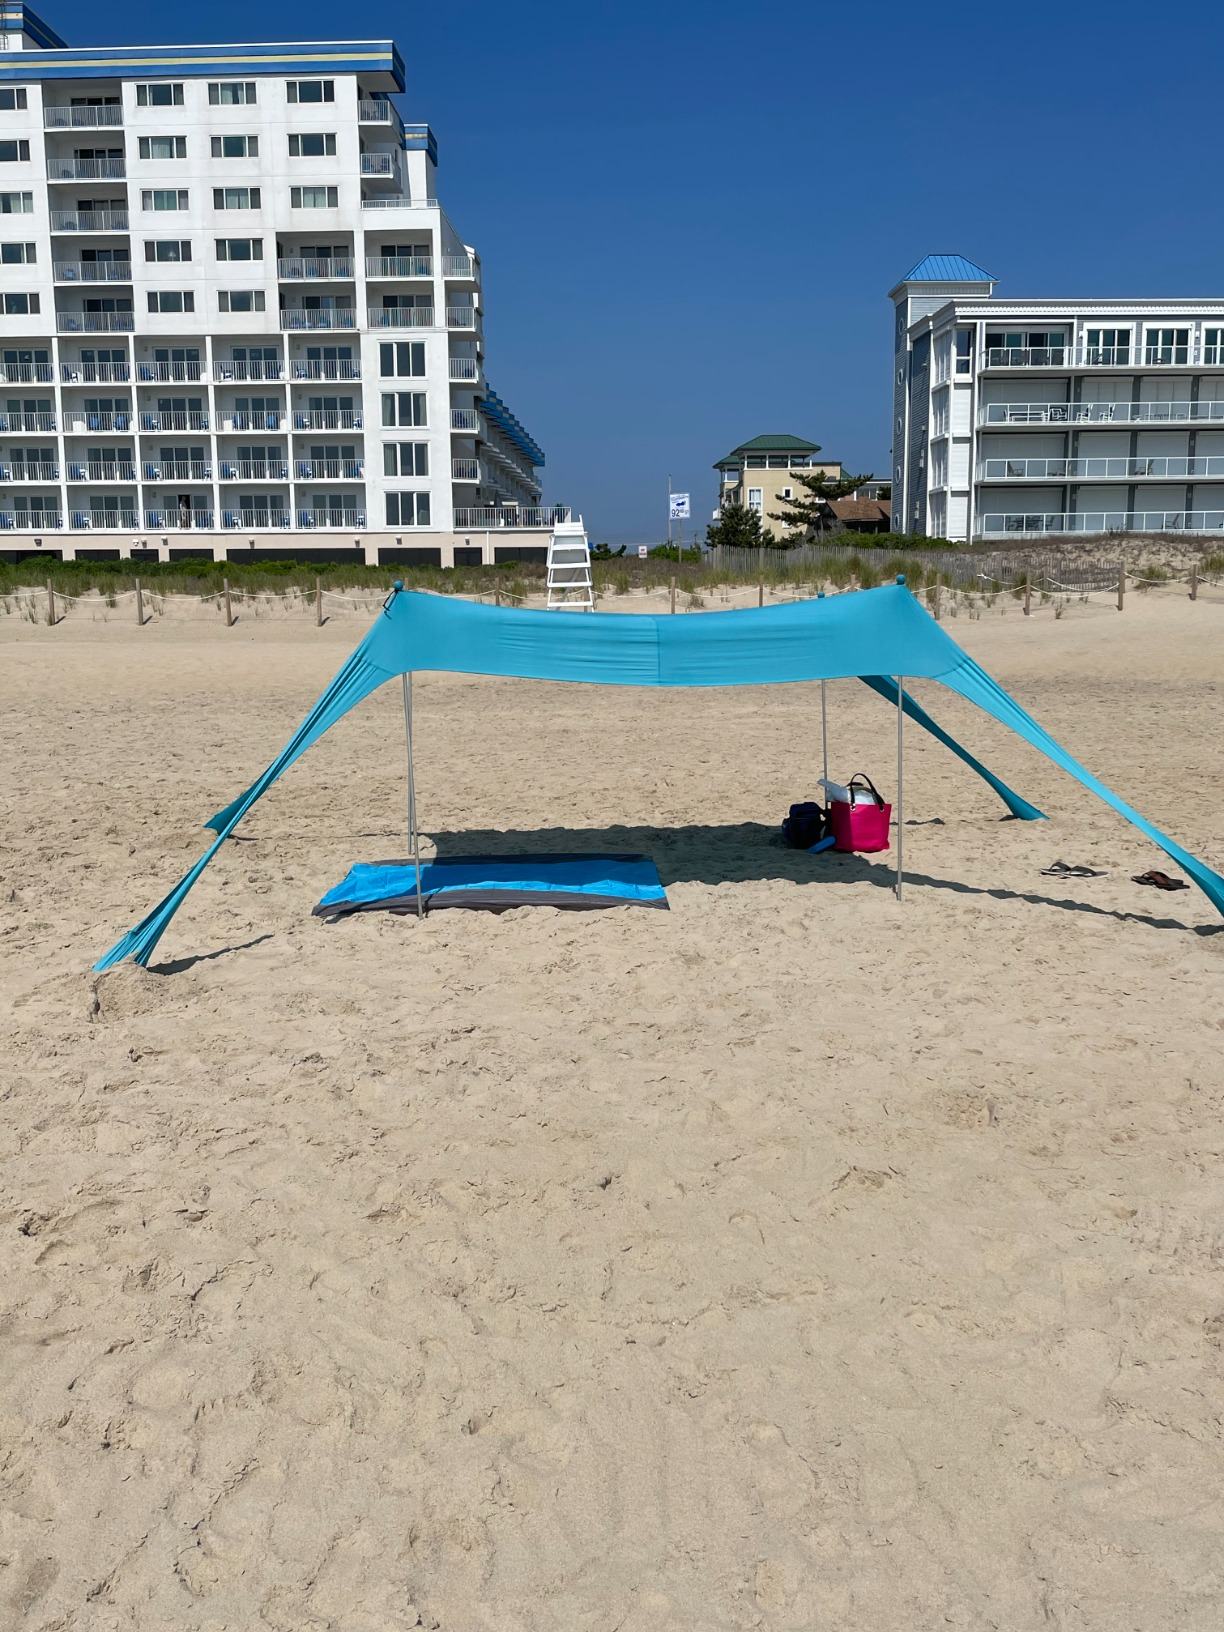 Nice C Beach Tent Canopy, Sun Shelter, Pop Up Sunshade Portable 6.6Ft/10Ft UPF 50+ with Carry Bag, Sand Shovel, Aluminum Poles Umbrella Outdoor, Pool, Garden (6.6x6.6 FT, 4 Pole, Blue) photo review